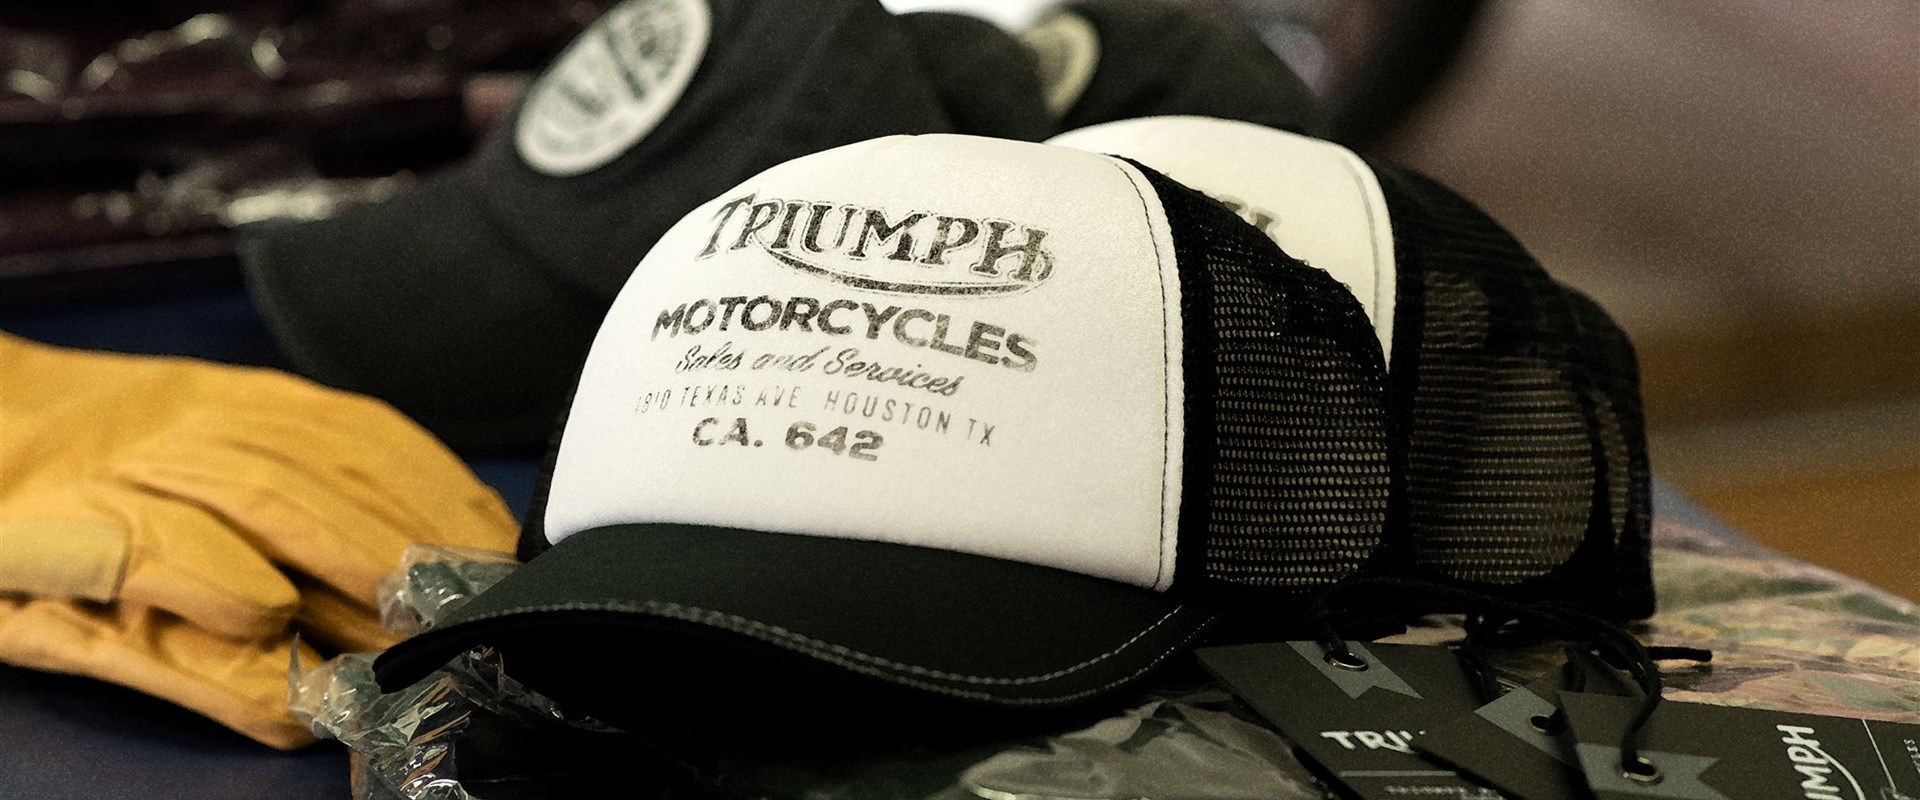 Get your Style - Triumph Originalbekleidung